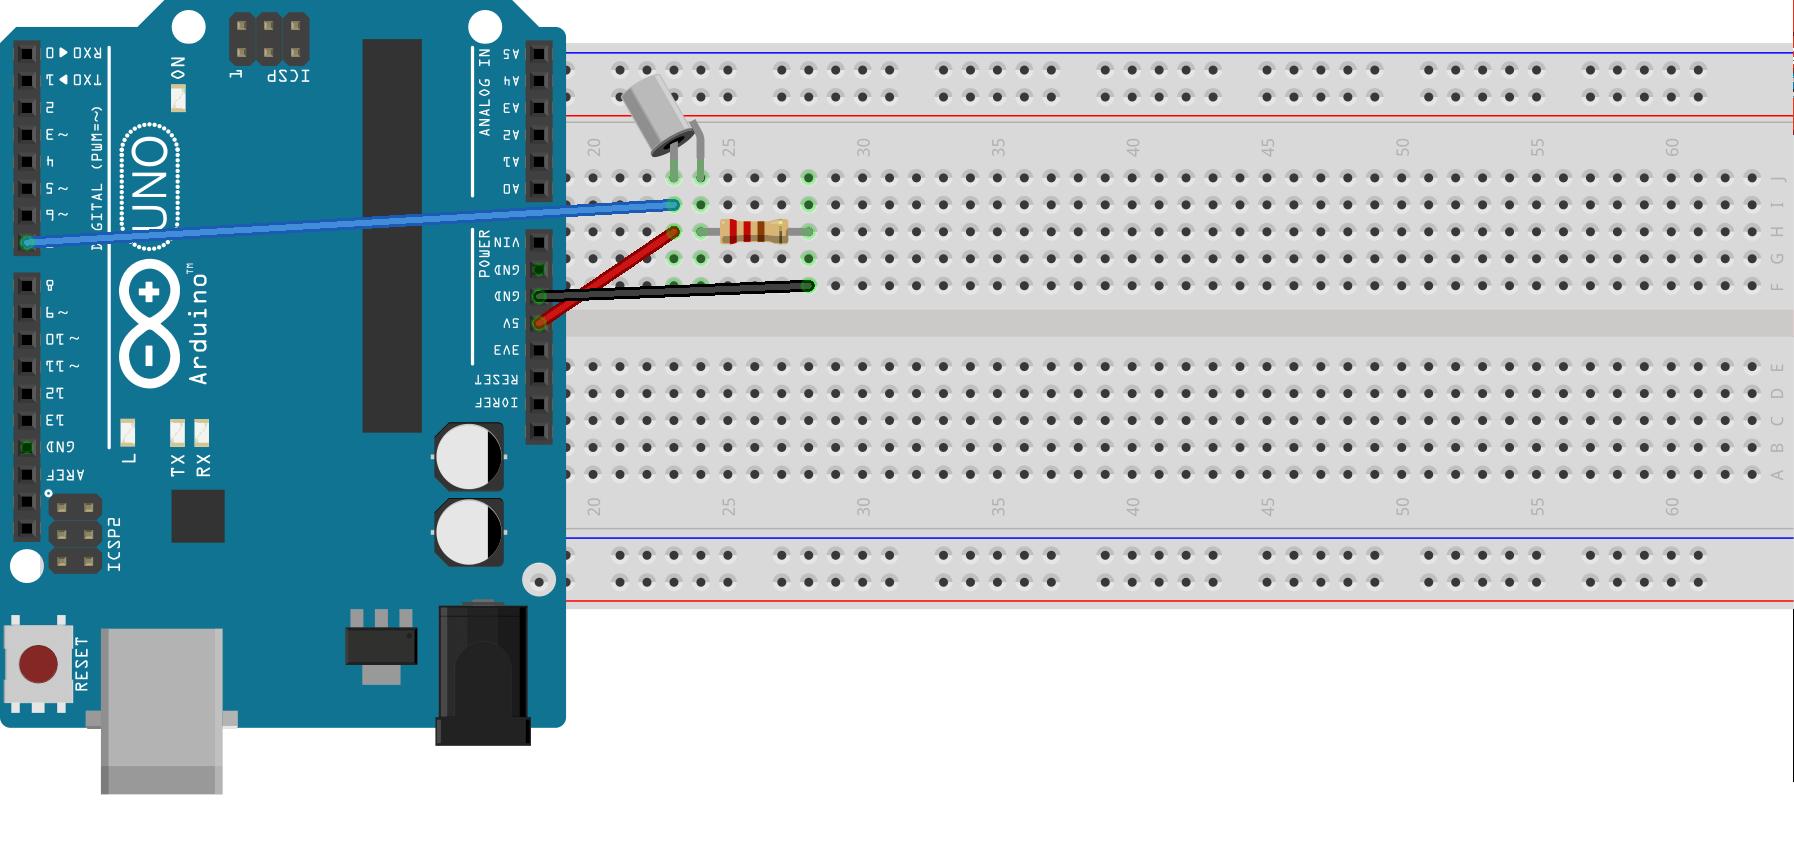 sensor de inclinación en Arduino